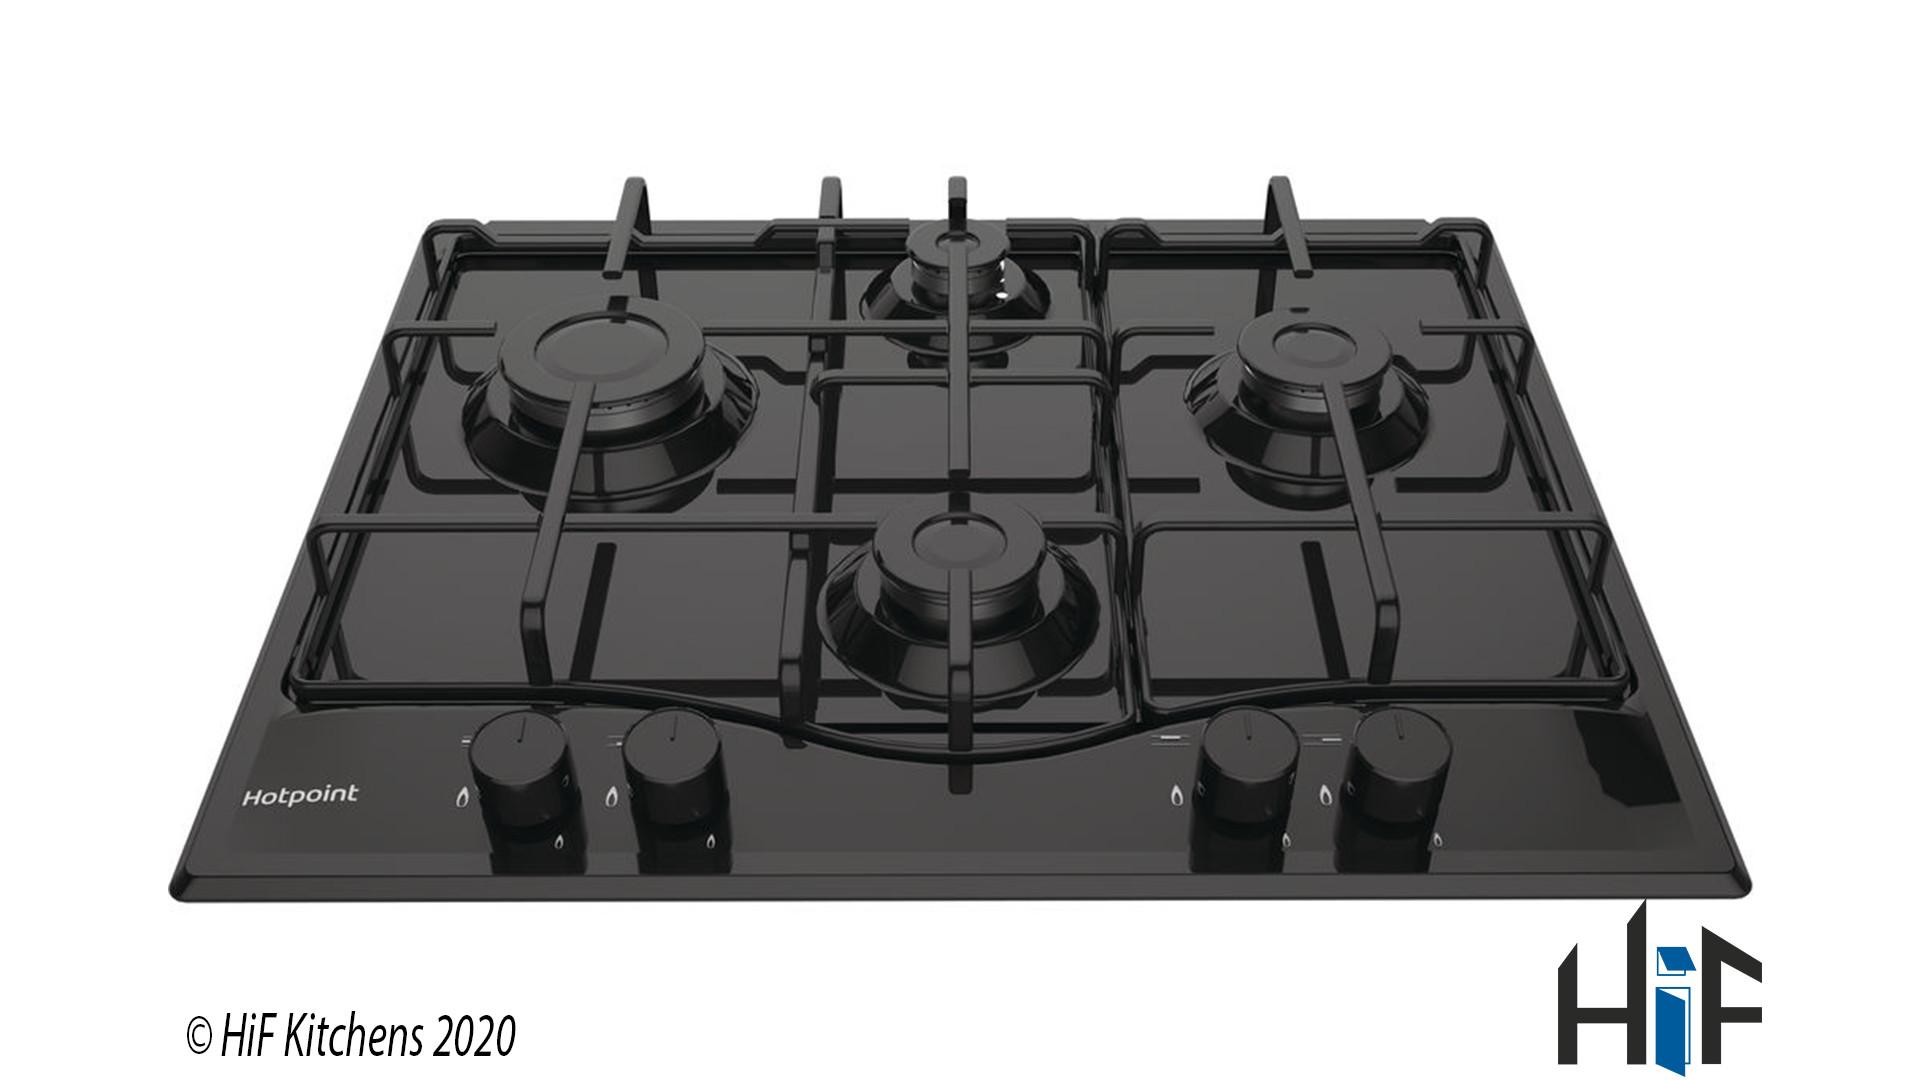 Hotpoint PCN642HBK 60cm Gas Hob